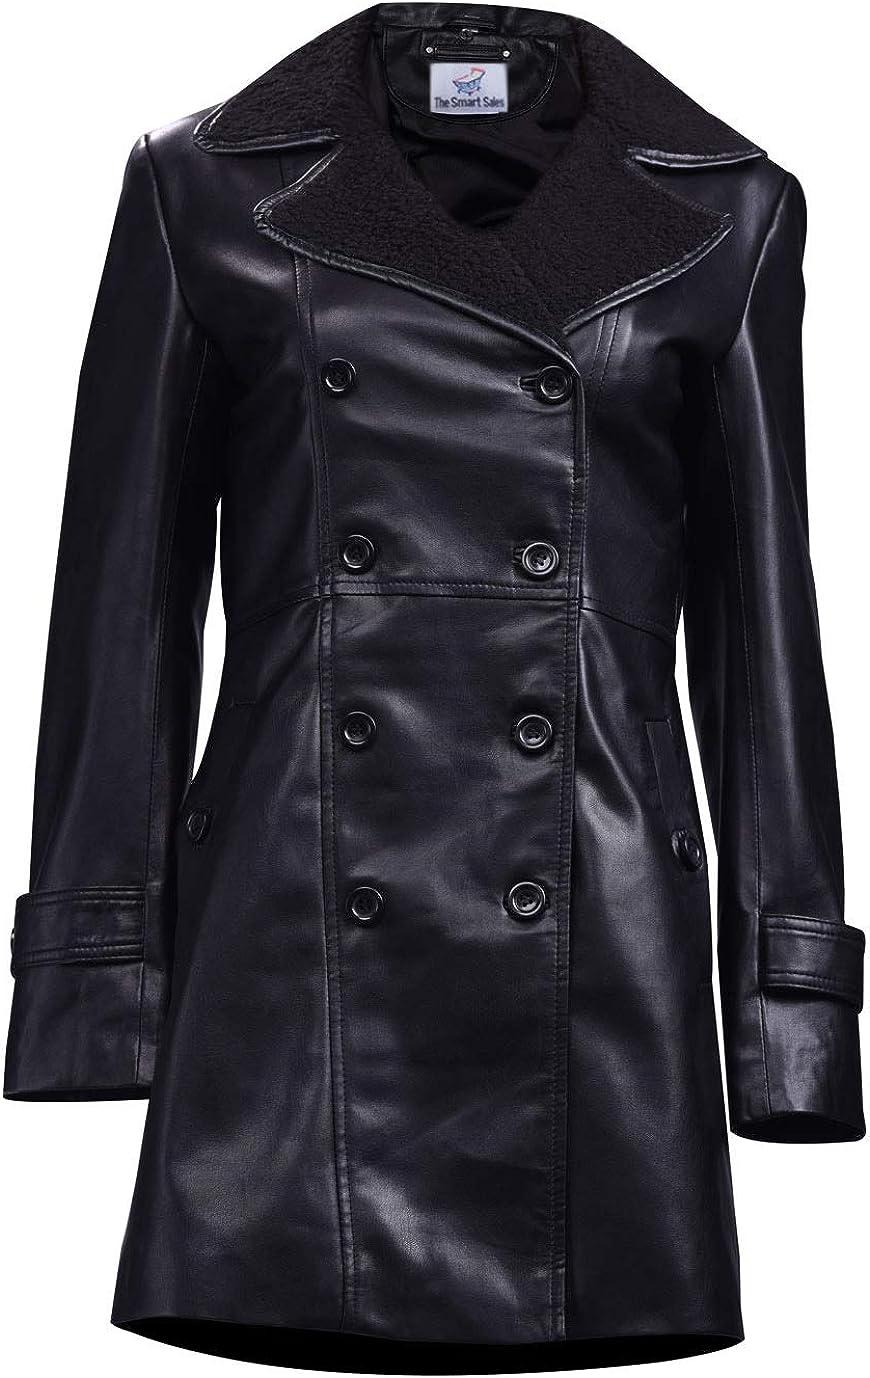 TheSmartSales Black Womens Classic Long Coat Faux Leather Jacket